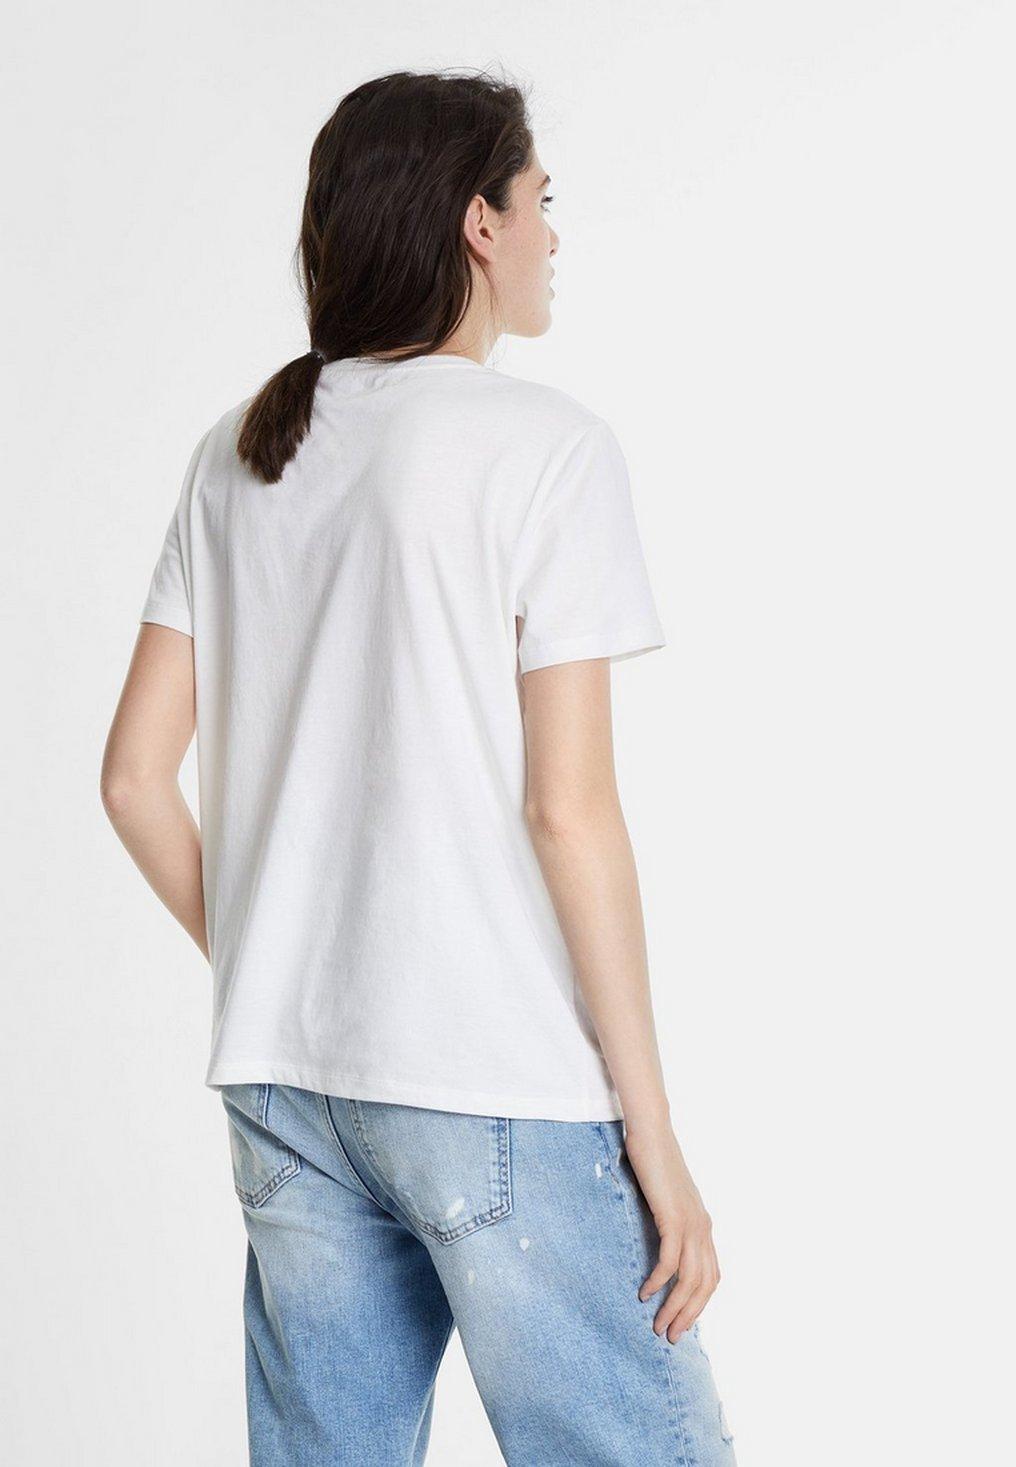 Desigual Print T-shirt - white